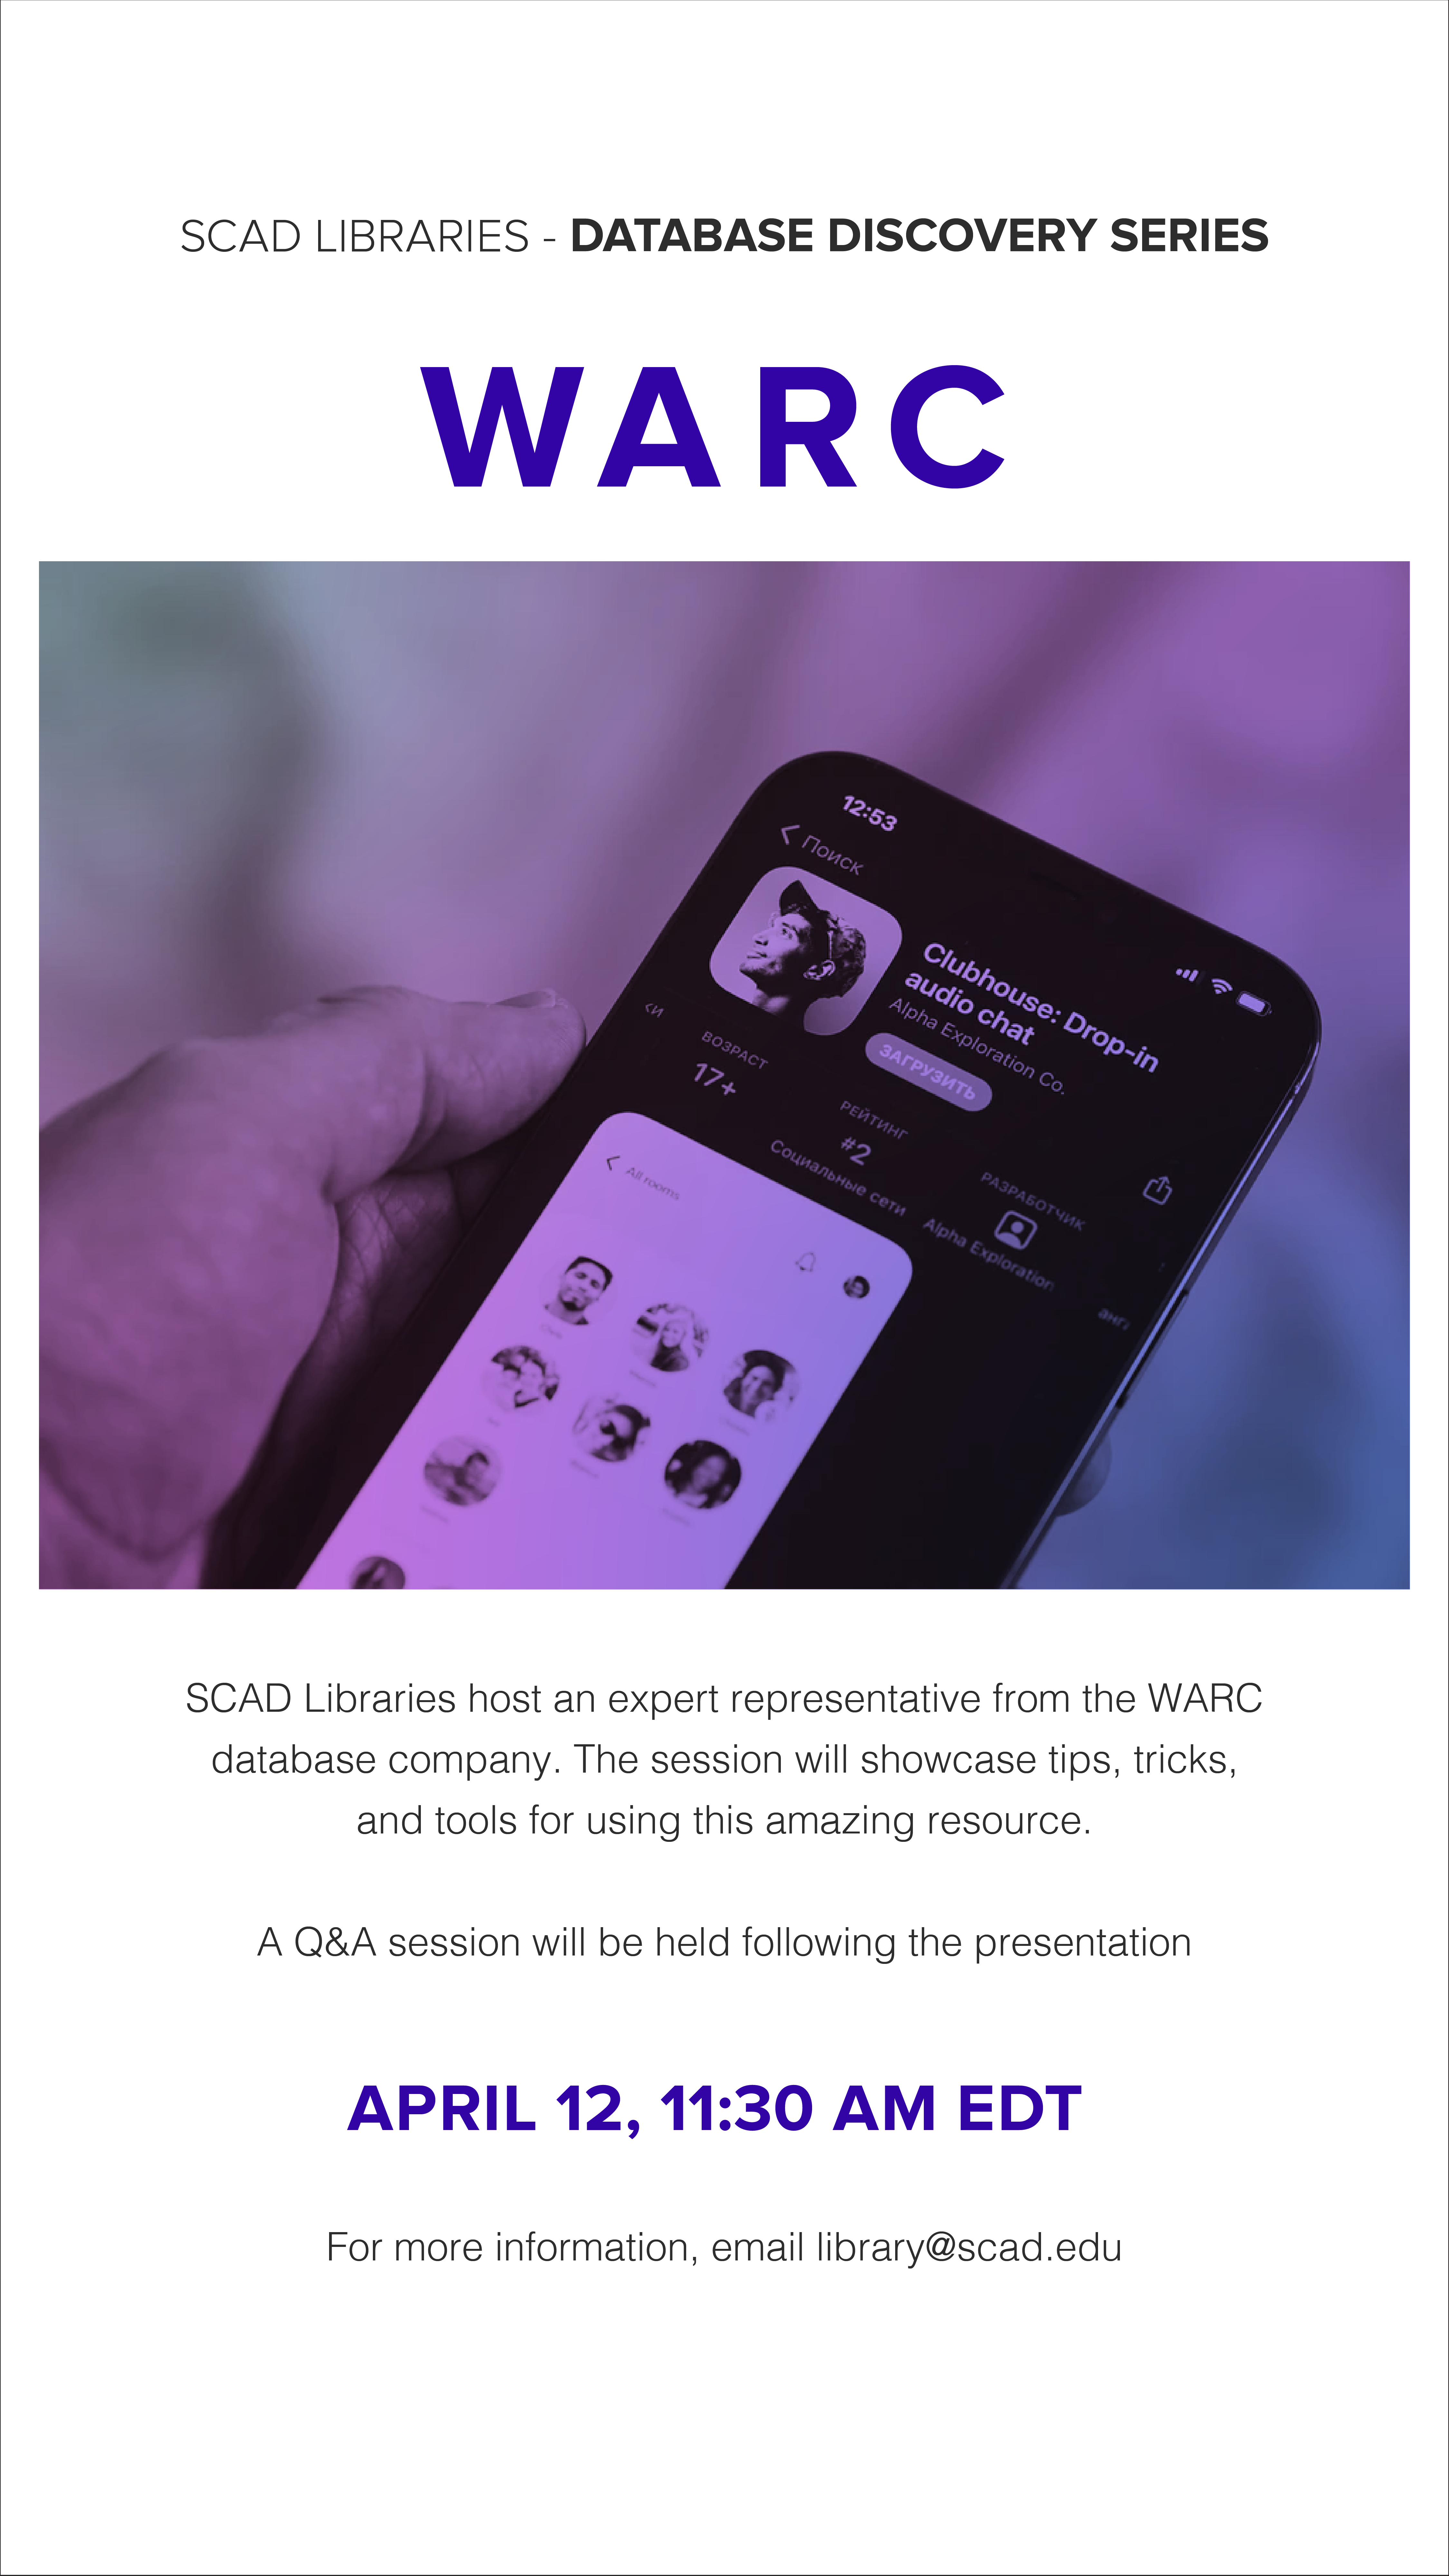 WARC flyer